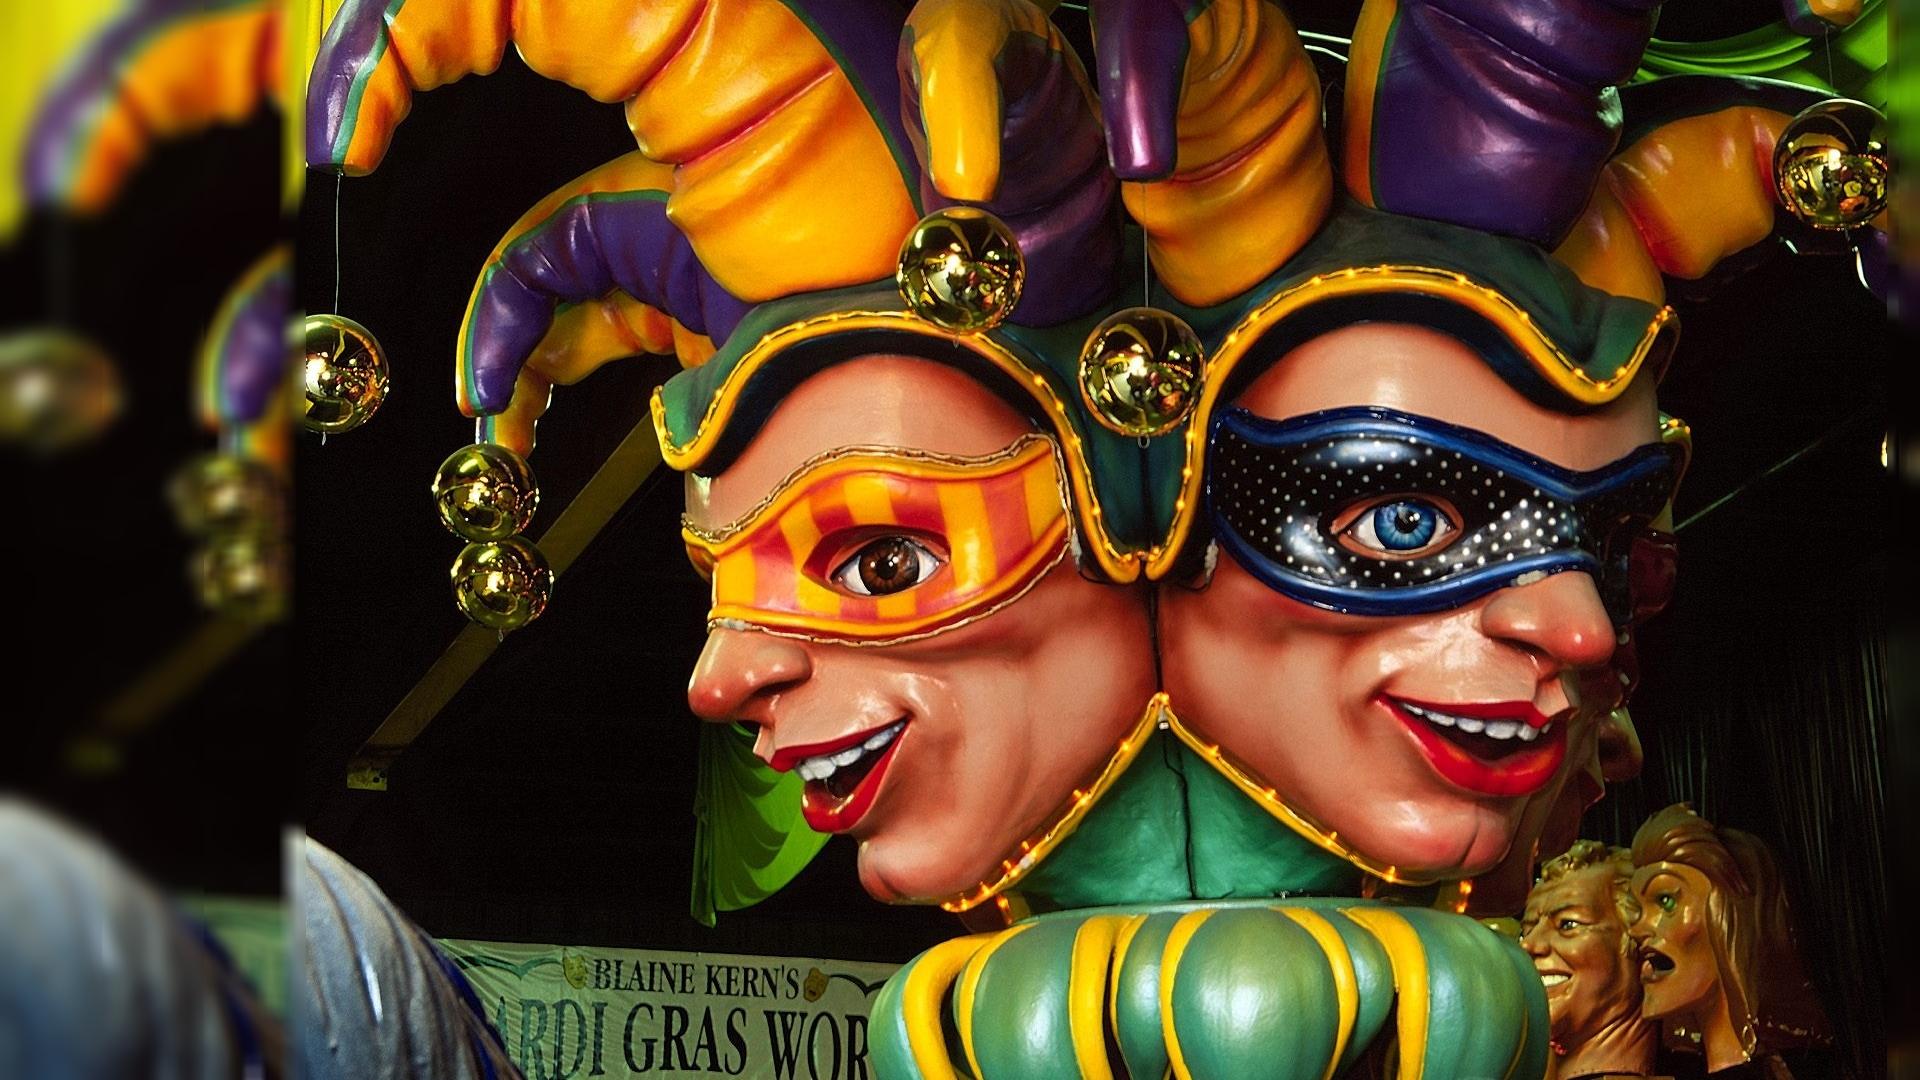 Mardi Gras Jokers wallpaper Mardi Gras Jokers hd wallpaper 1920x1080